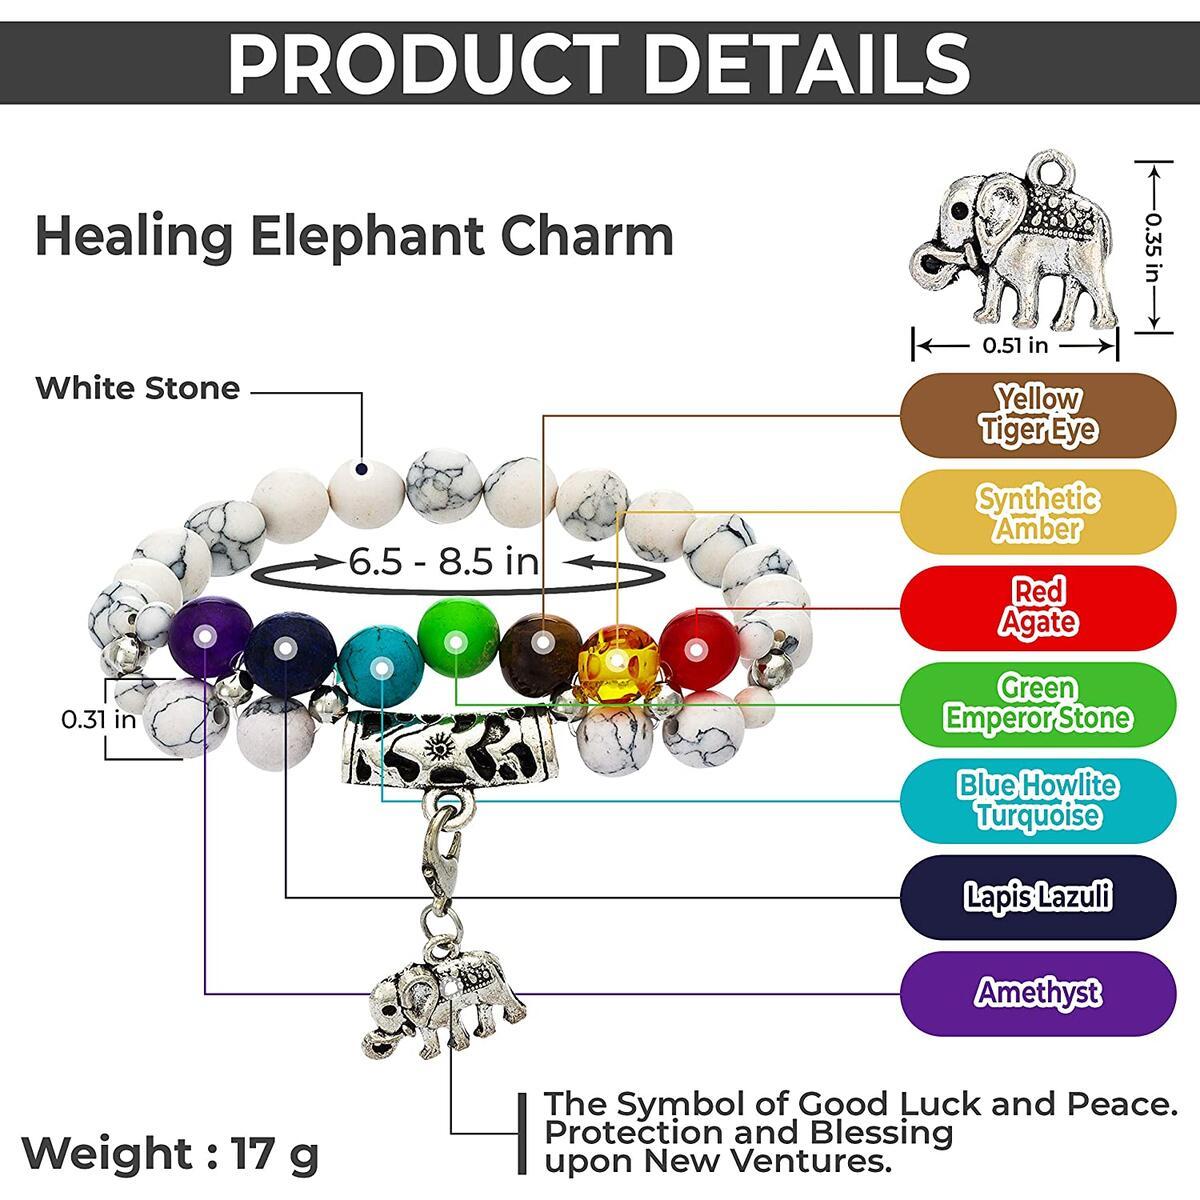 Imperial Deluxe 7 Chakra Bracelet for Women Men 8mm Lava Rock Stone Essential Oil Diffuser Healing Anxiety Distance Couple Friendship Charm Bracelet